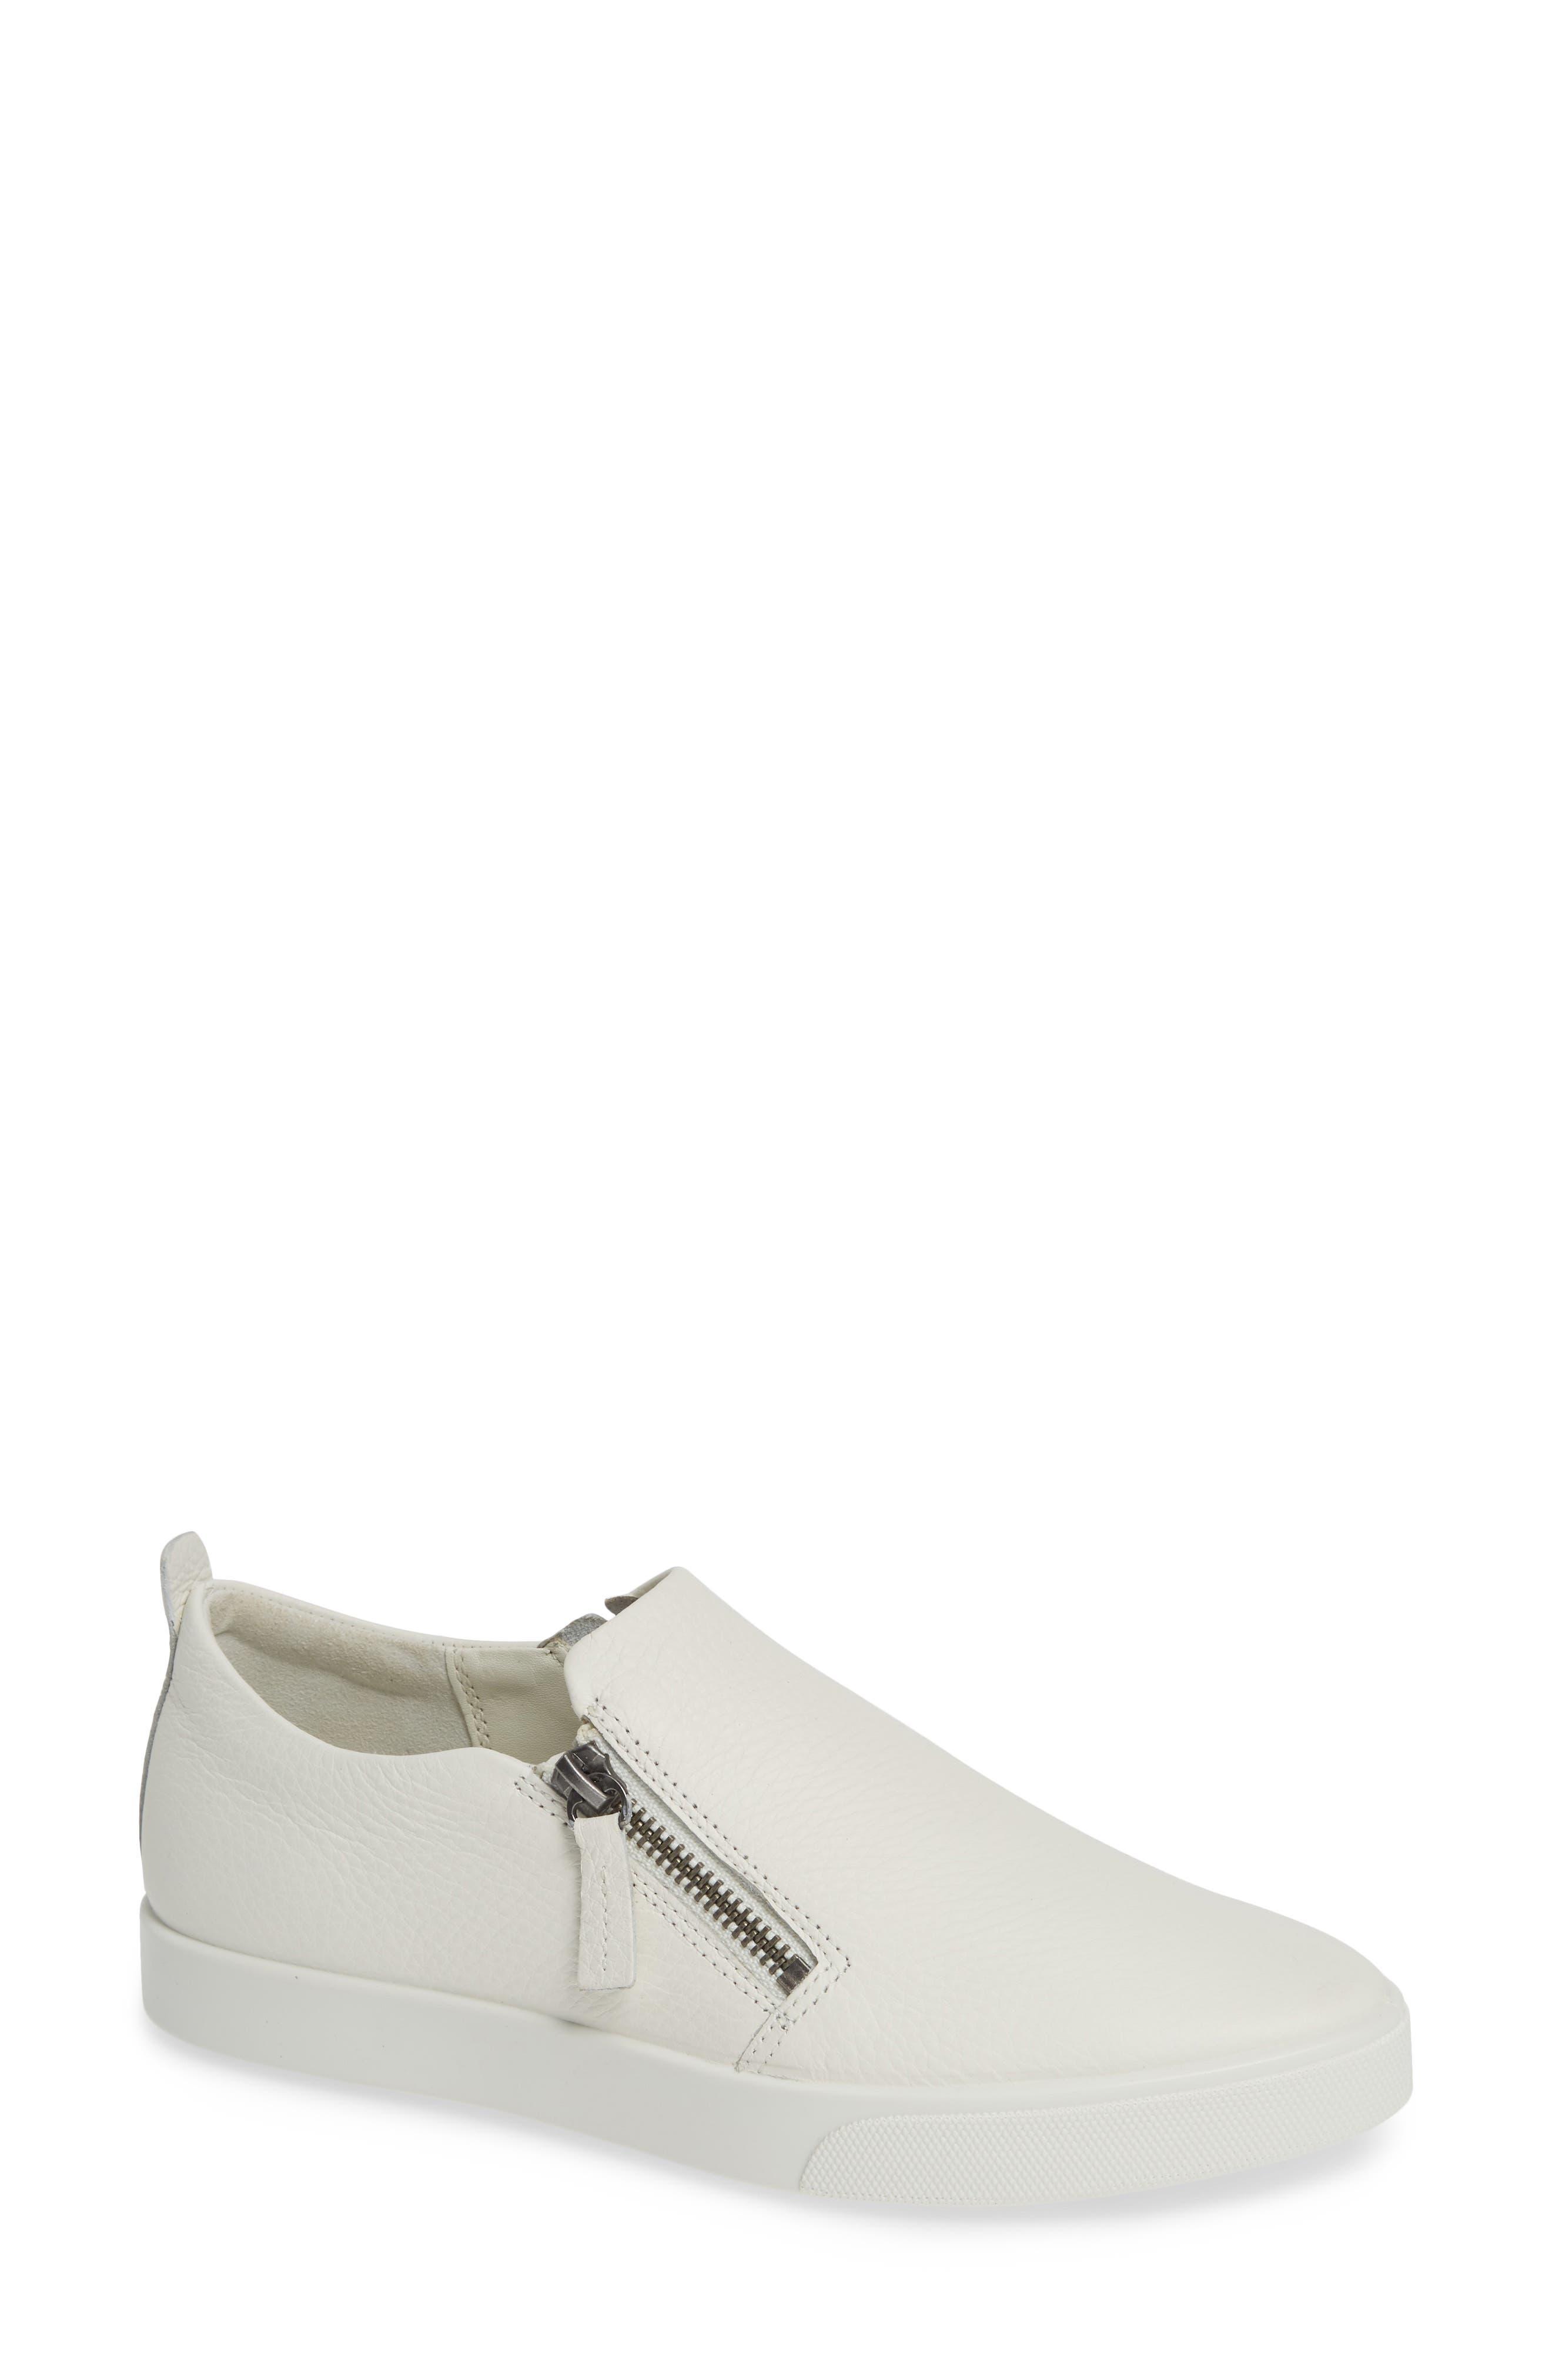 Ecco Gillian Side Zip Sneaker, White